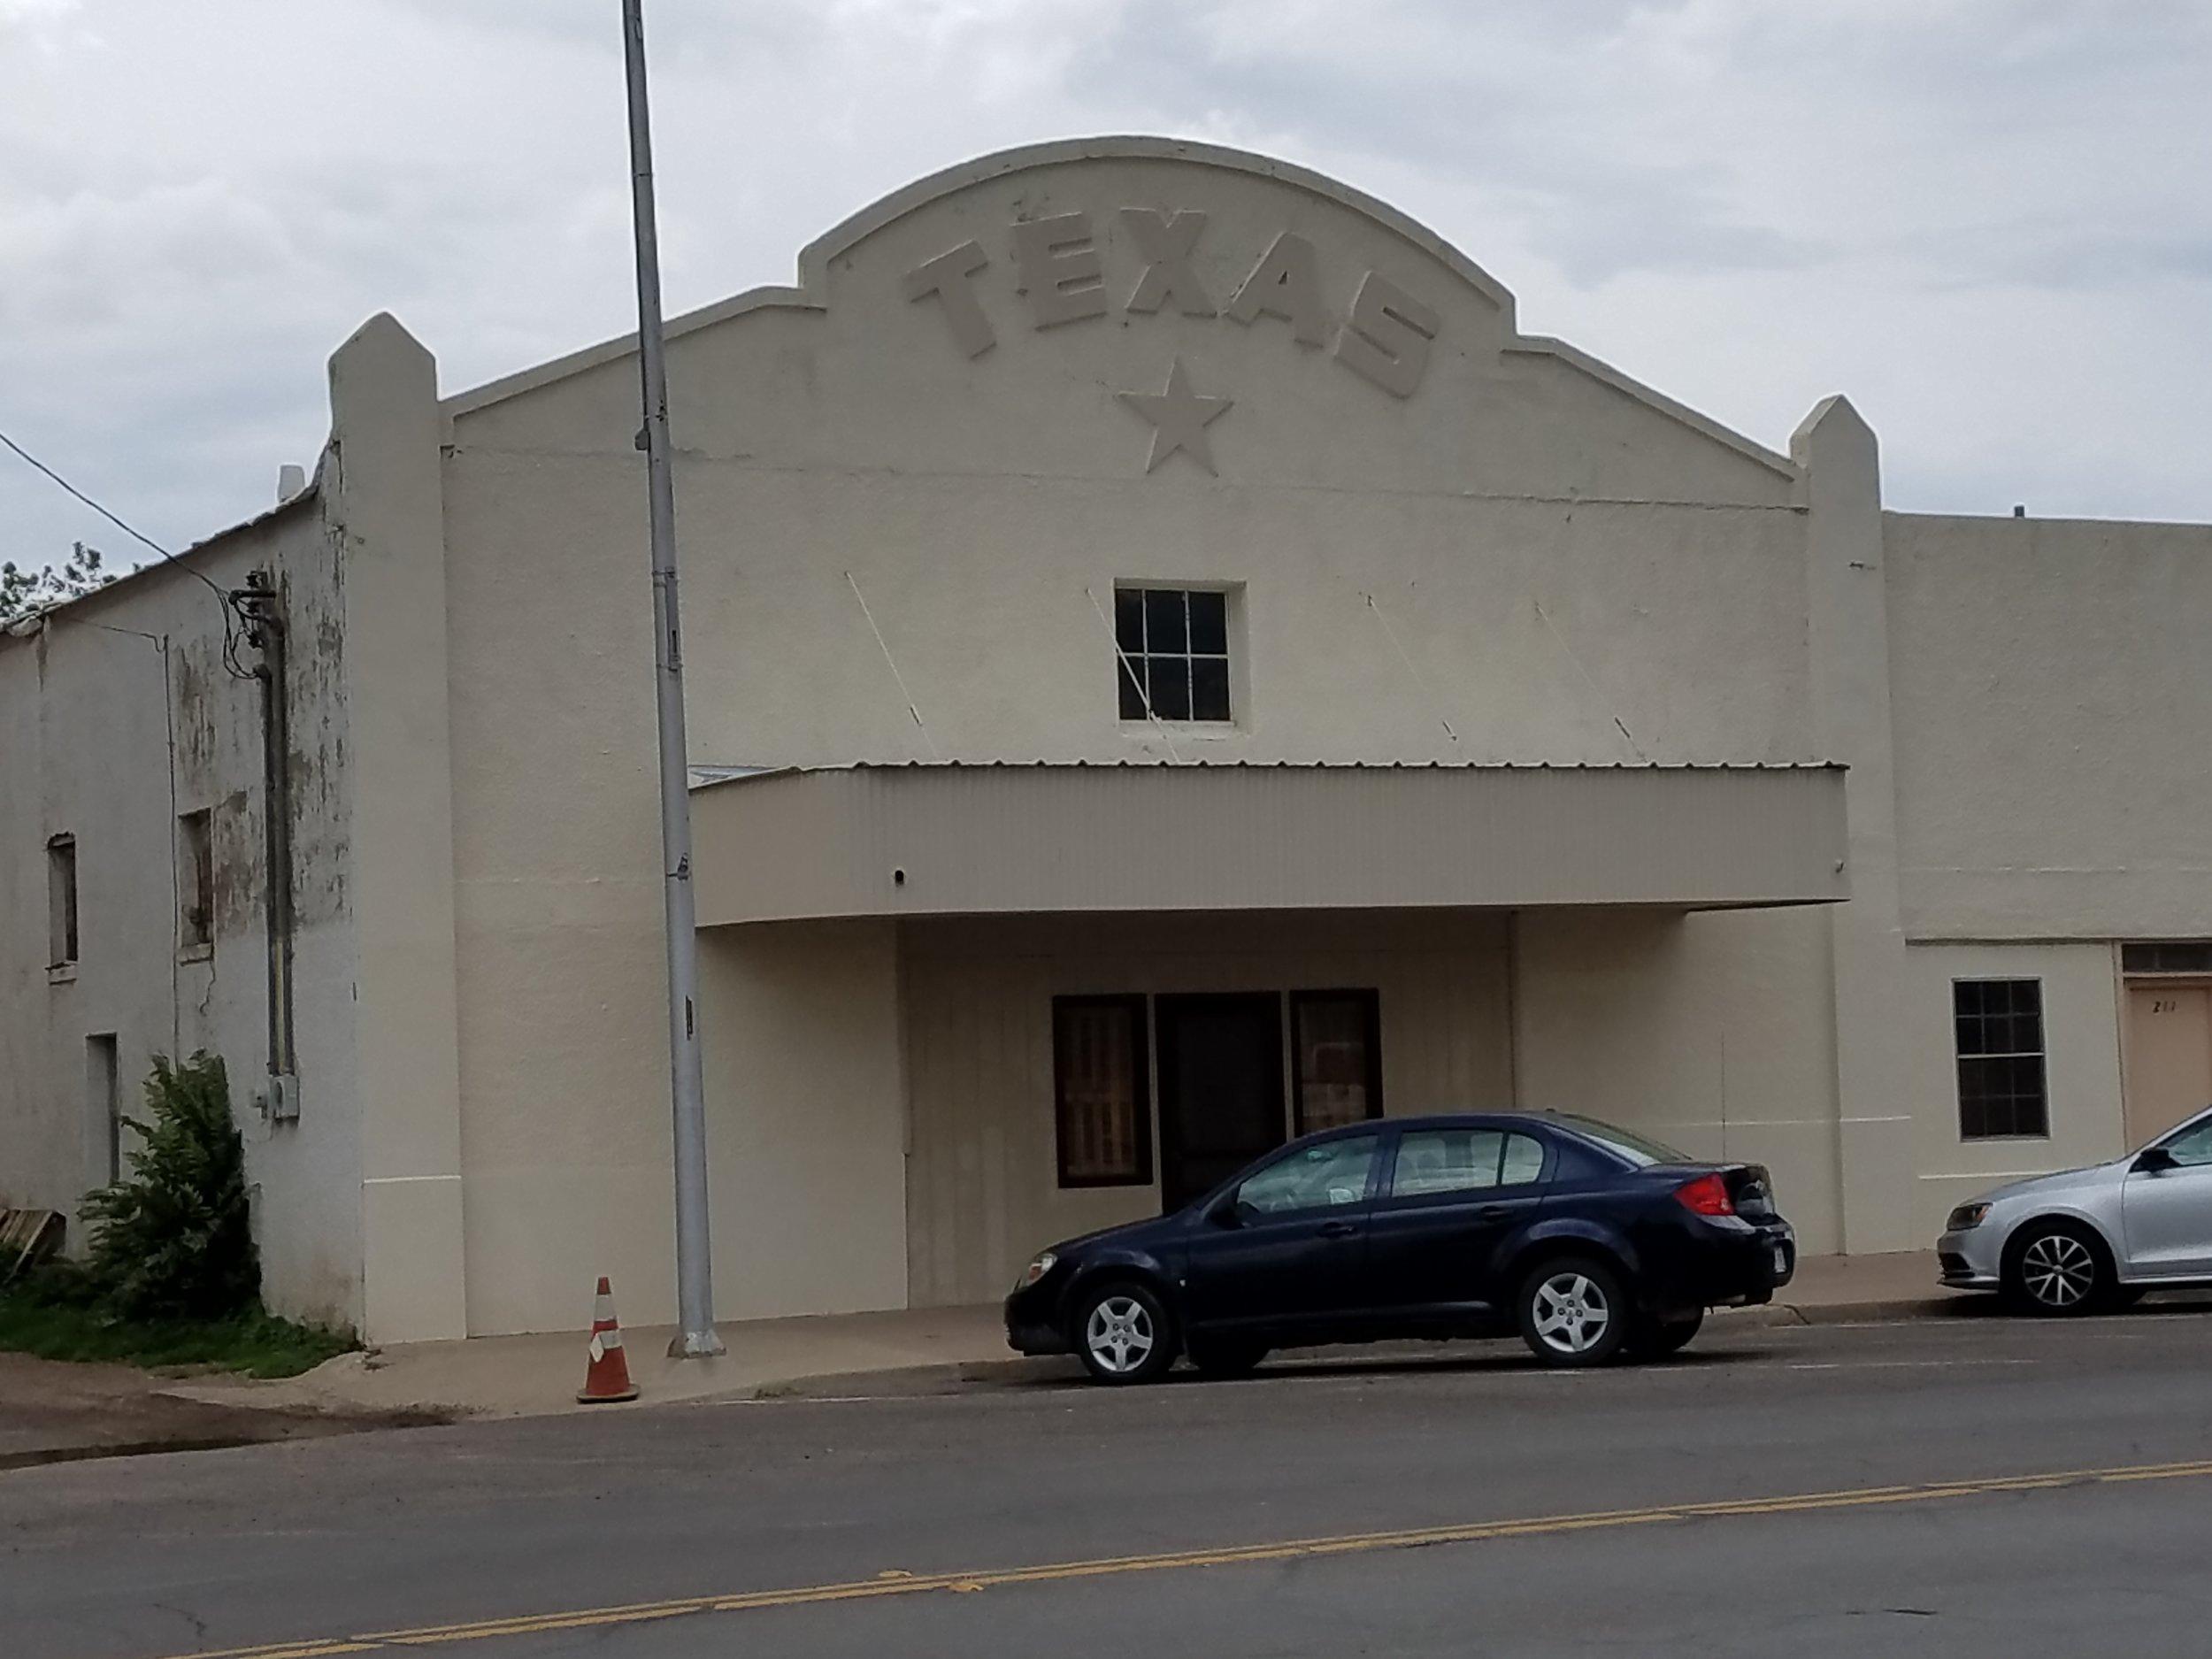 Marfa, Texas. Abandoned movie house?